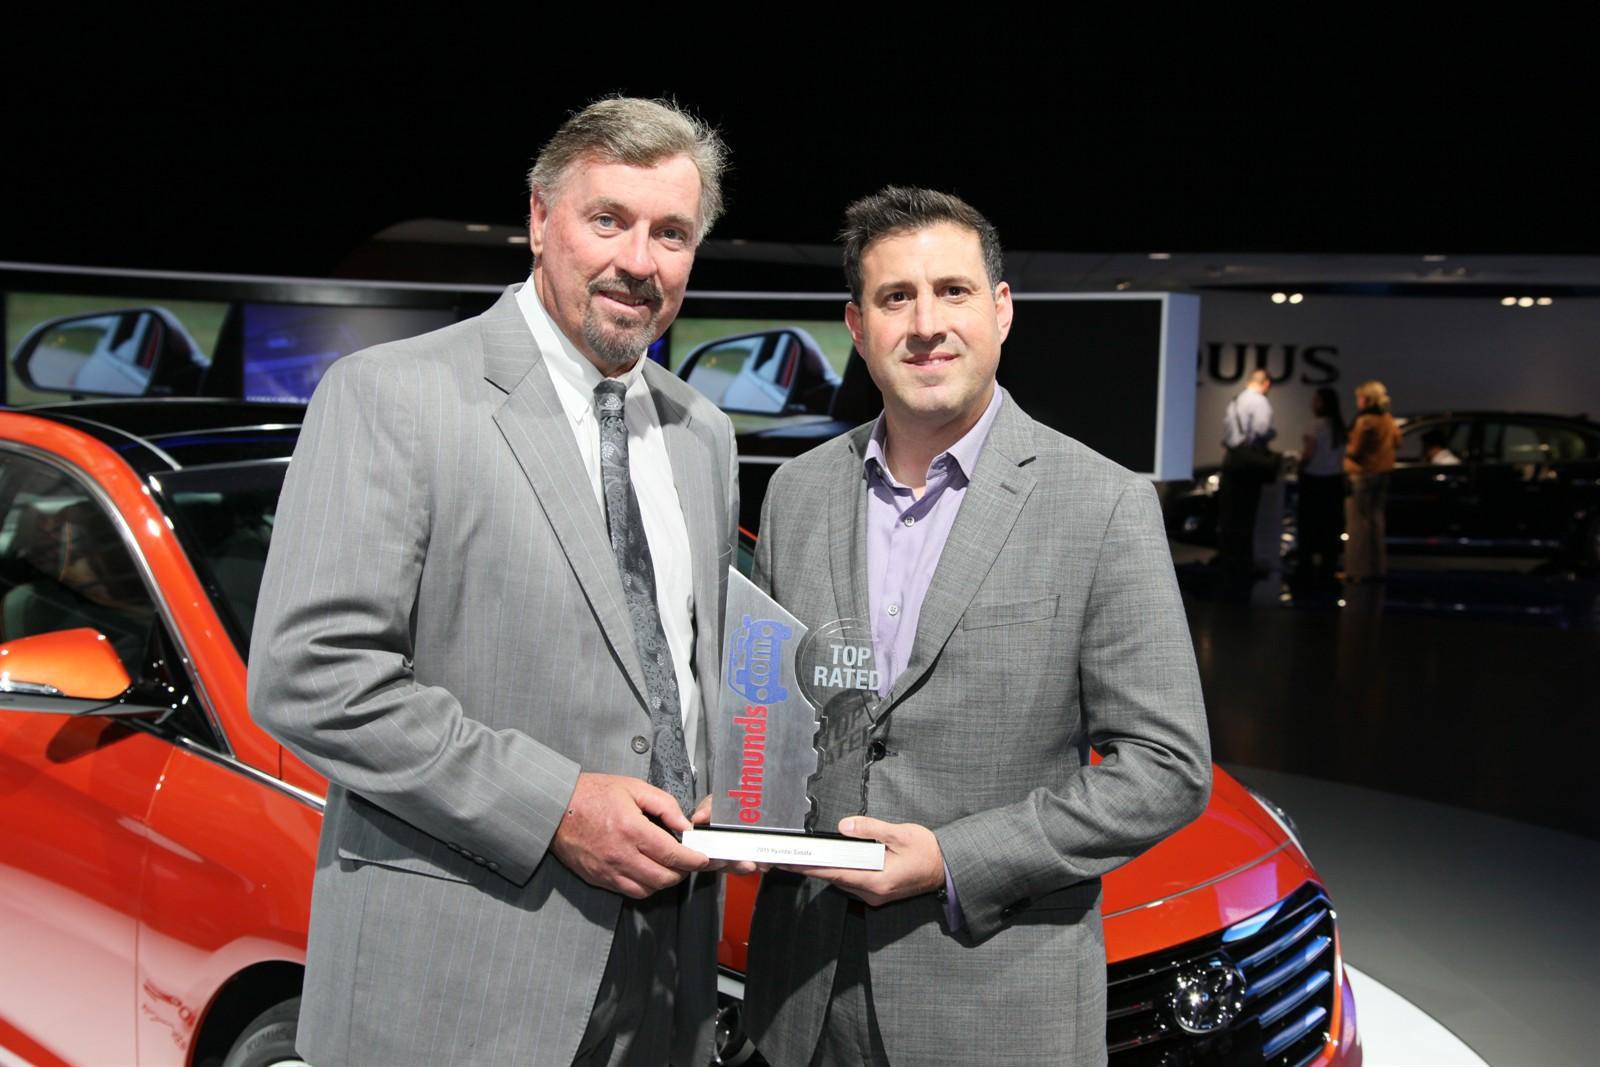 2015 Sonata Named Top Rated Sedan By Edmunds.com